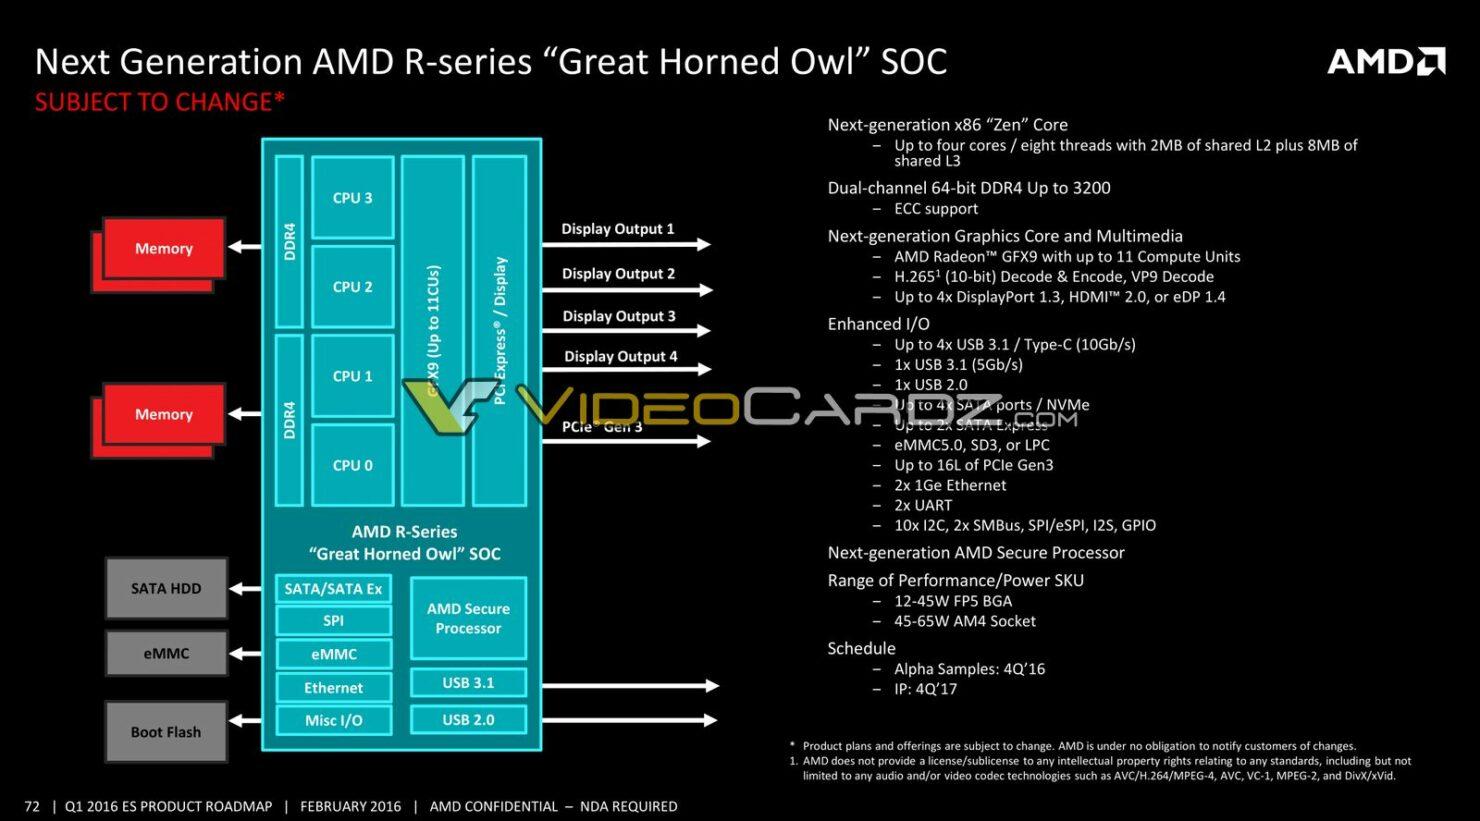 amd-great-horned-owl-soc-for-embedded-r-series-platform_specs-2